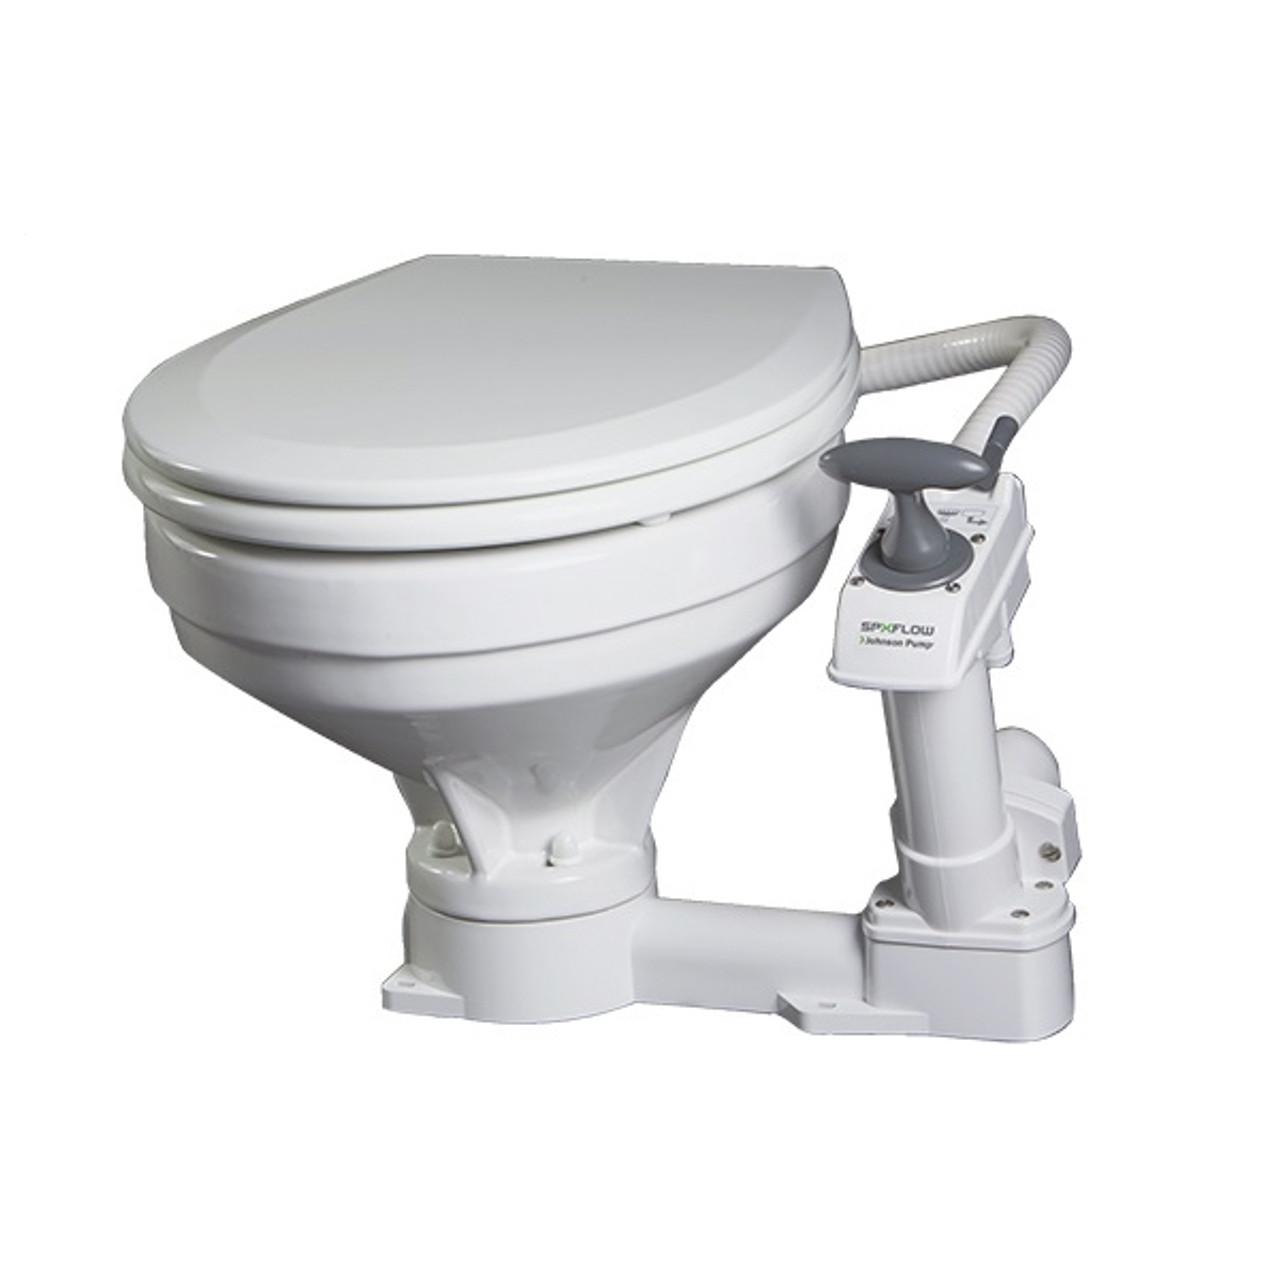 Fine Johnson Aquat Comfort Marine Toilet Machost Co Dining Chair Design Ideas Machostcouk